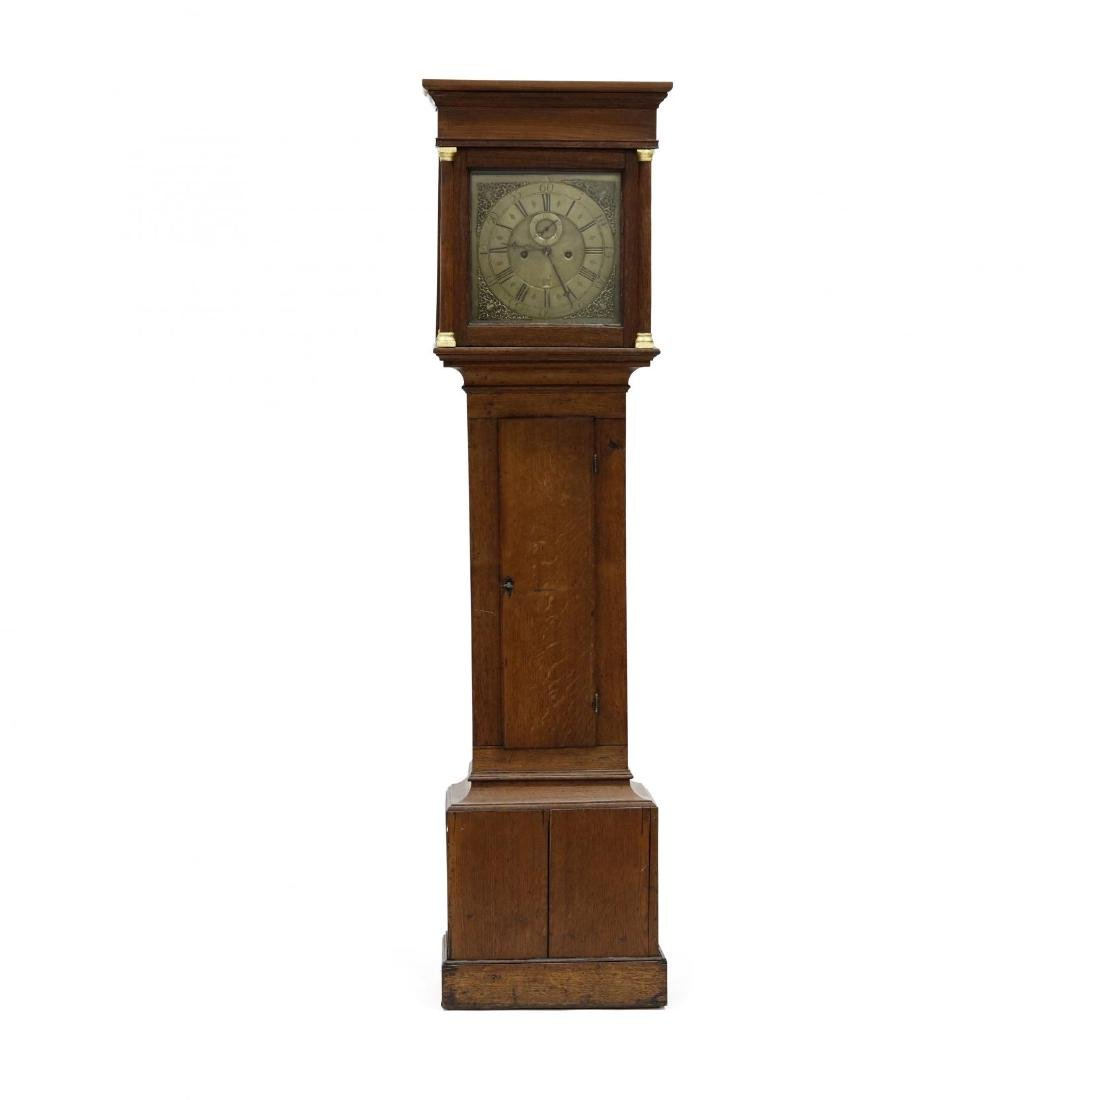 English Tall Case Clock, Richard Kenyon